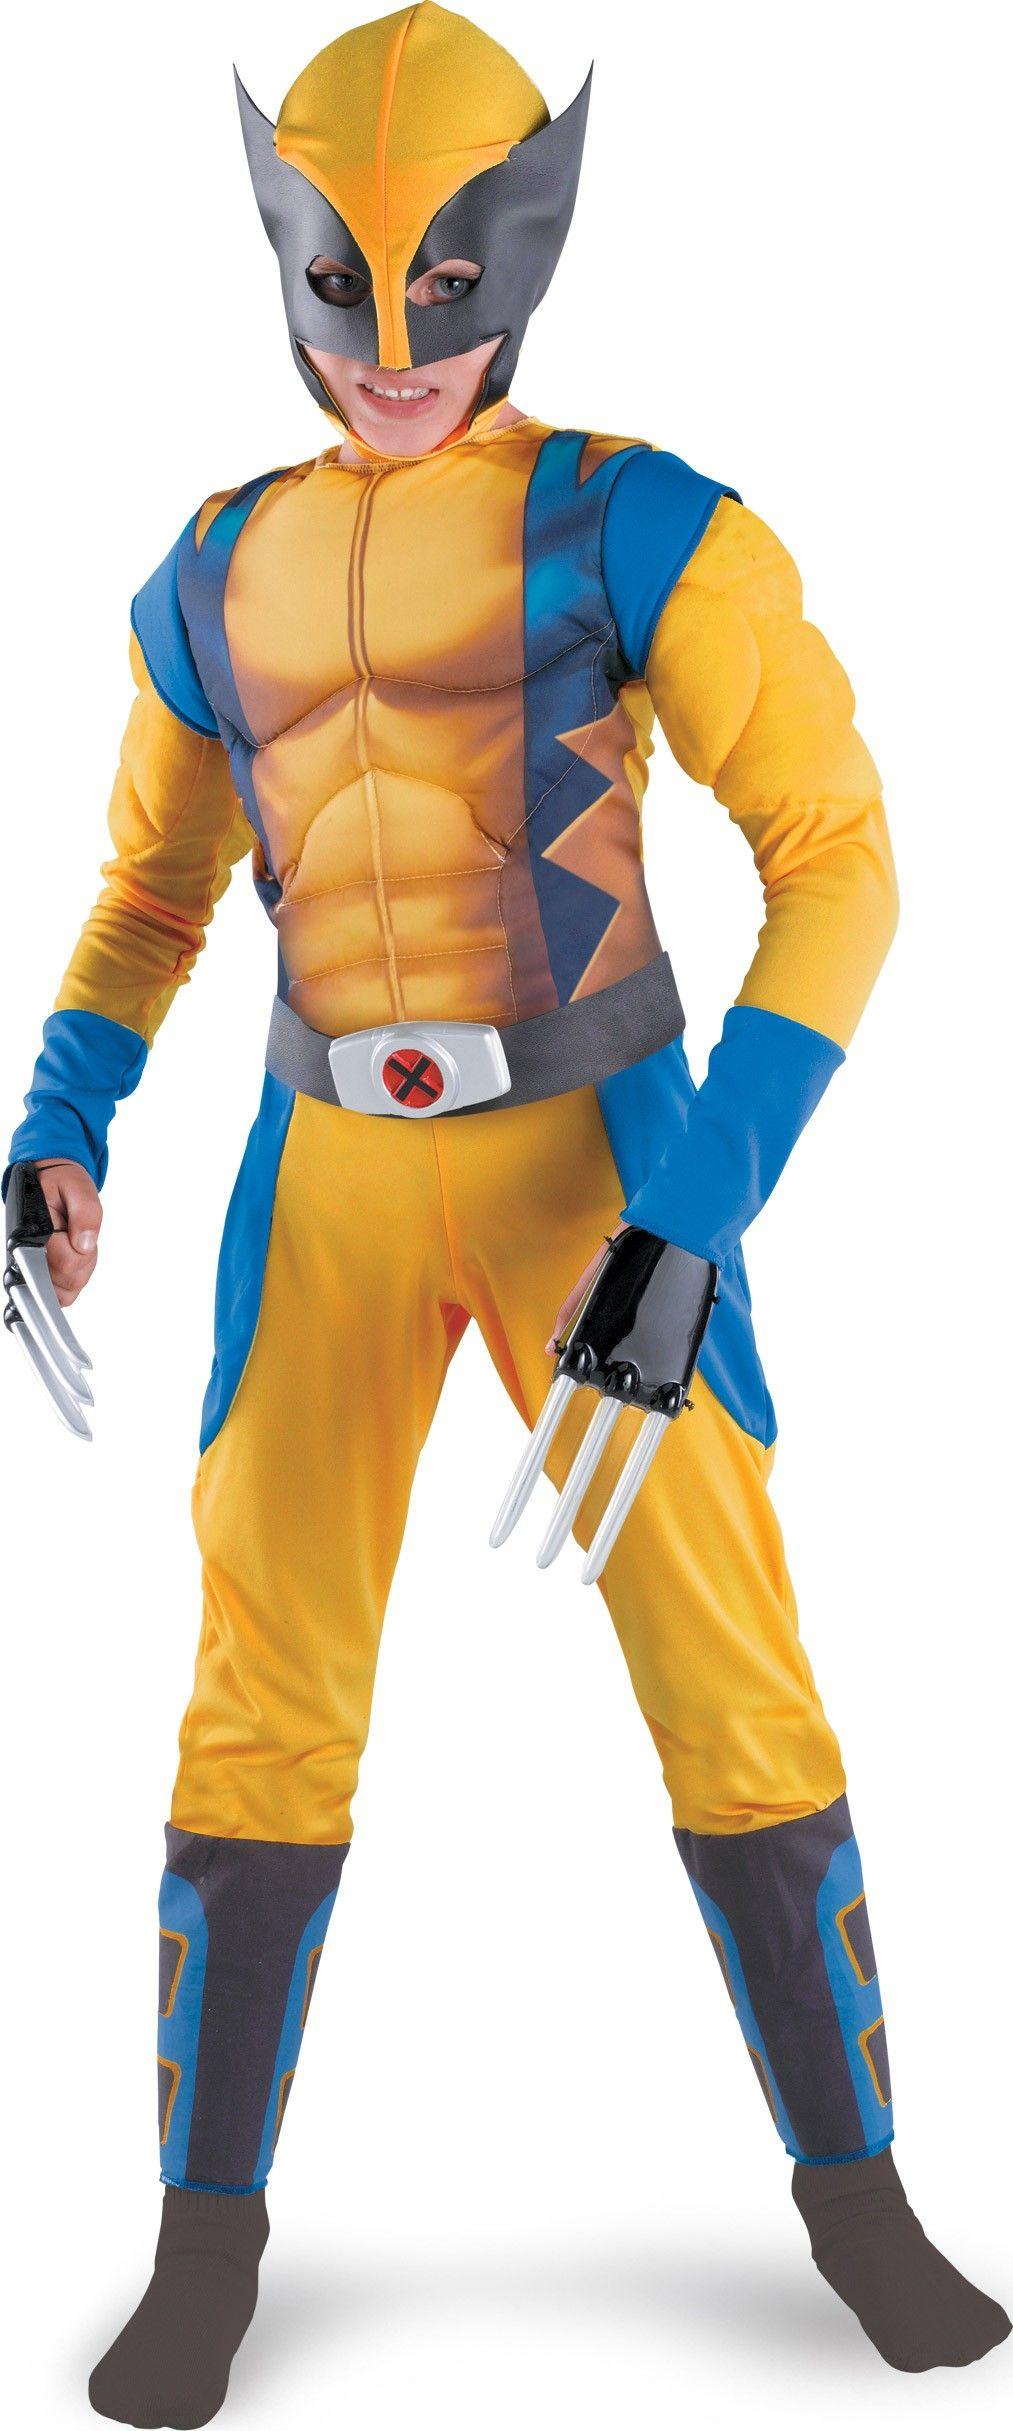 Wolverine Origins Classic Muscle Child Costume Wolverine